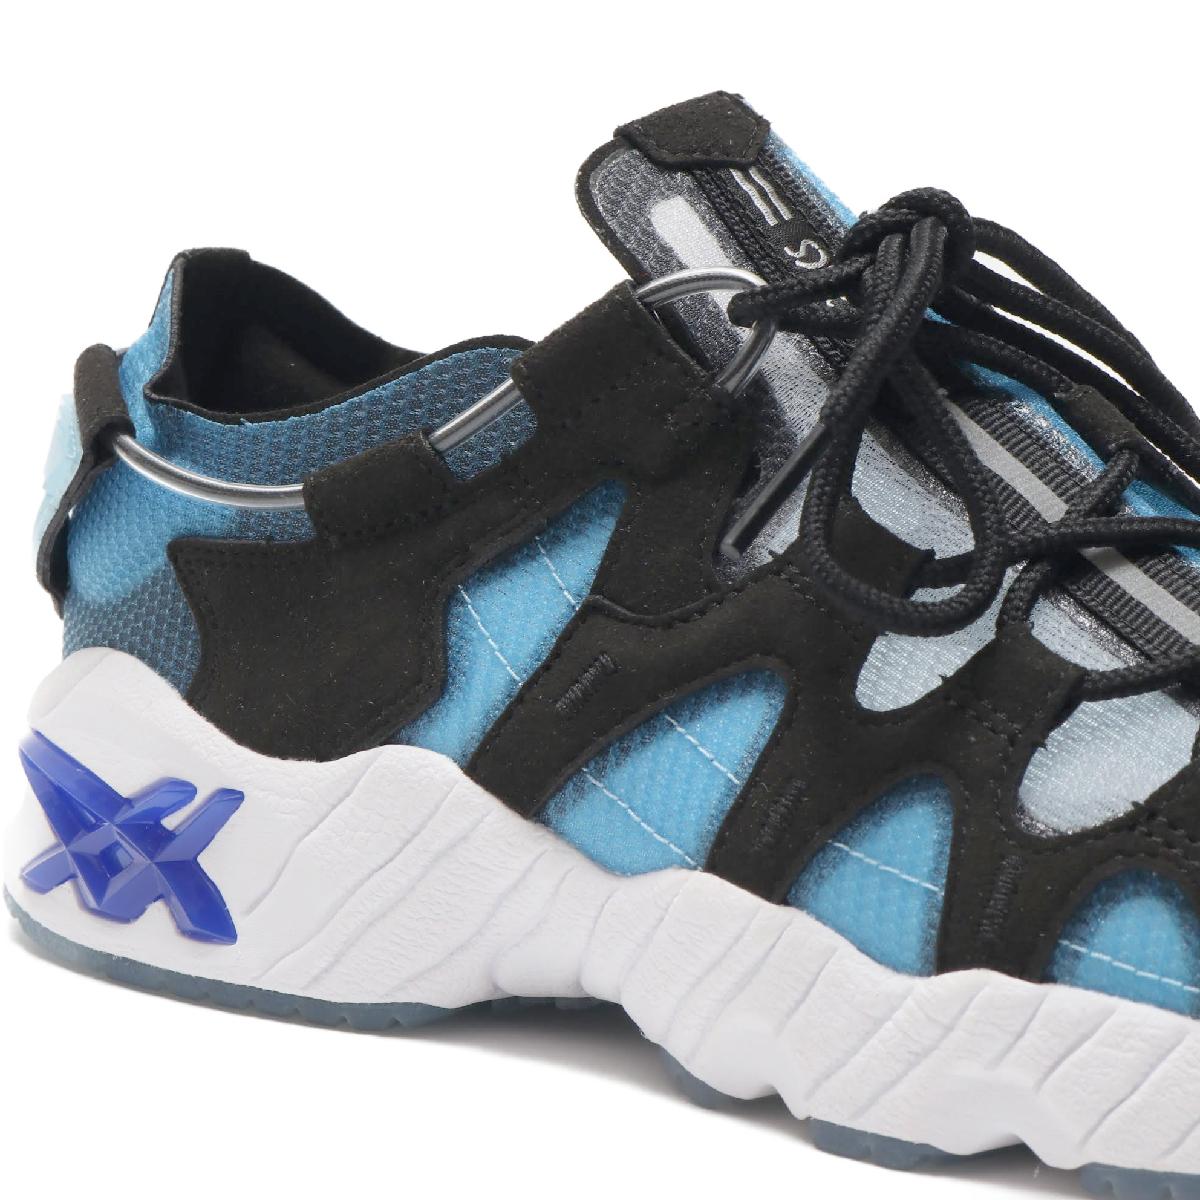 f:id:sneakerscaffetokyo:20190704091247j:plain